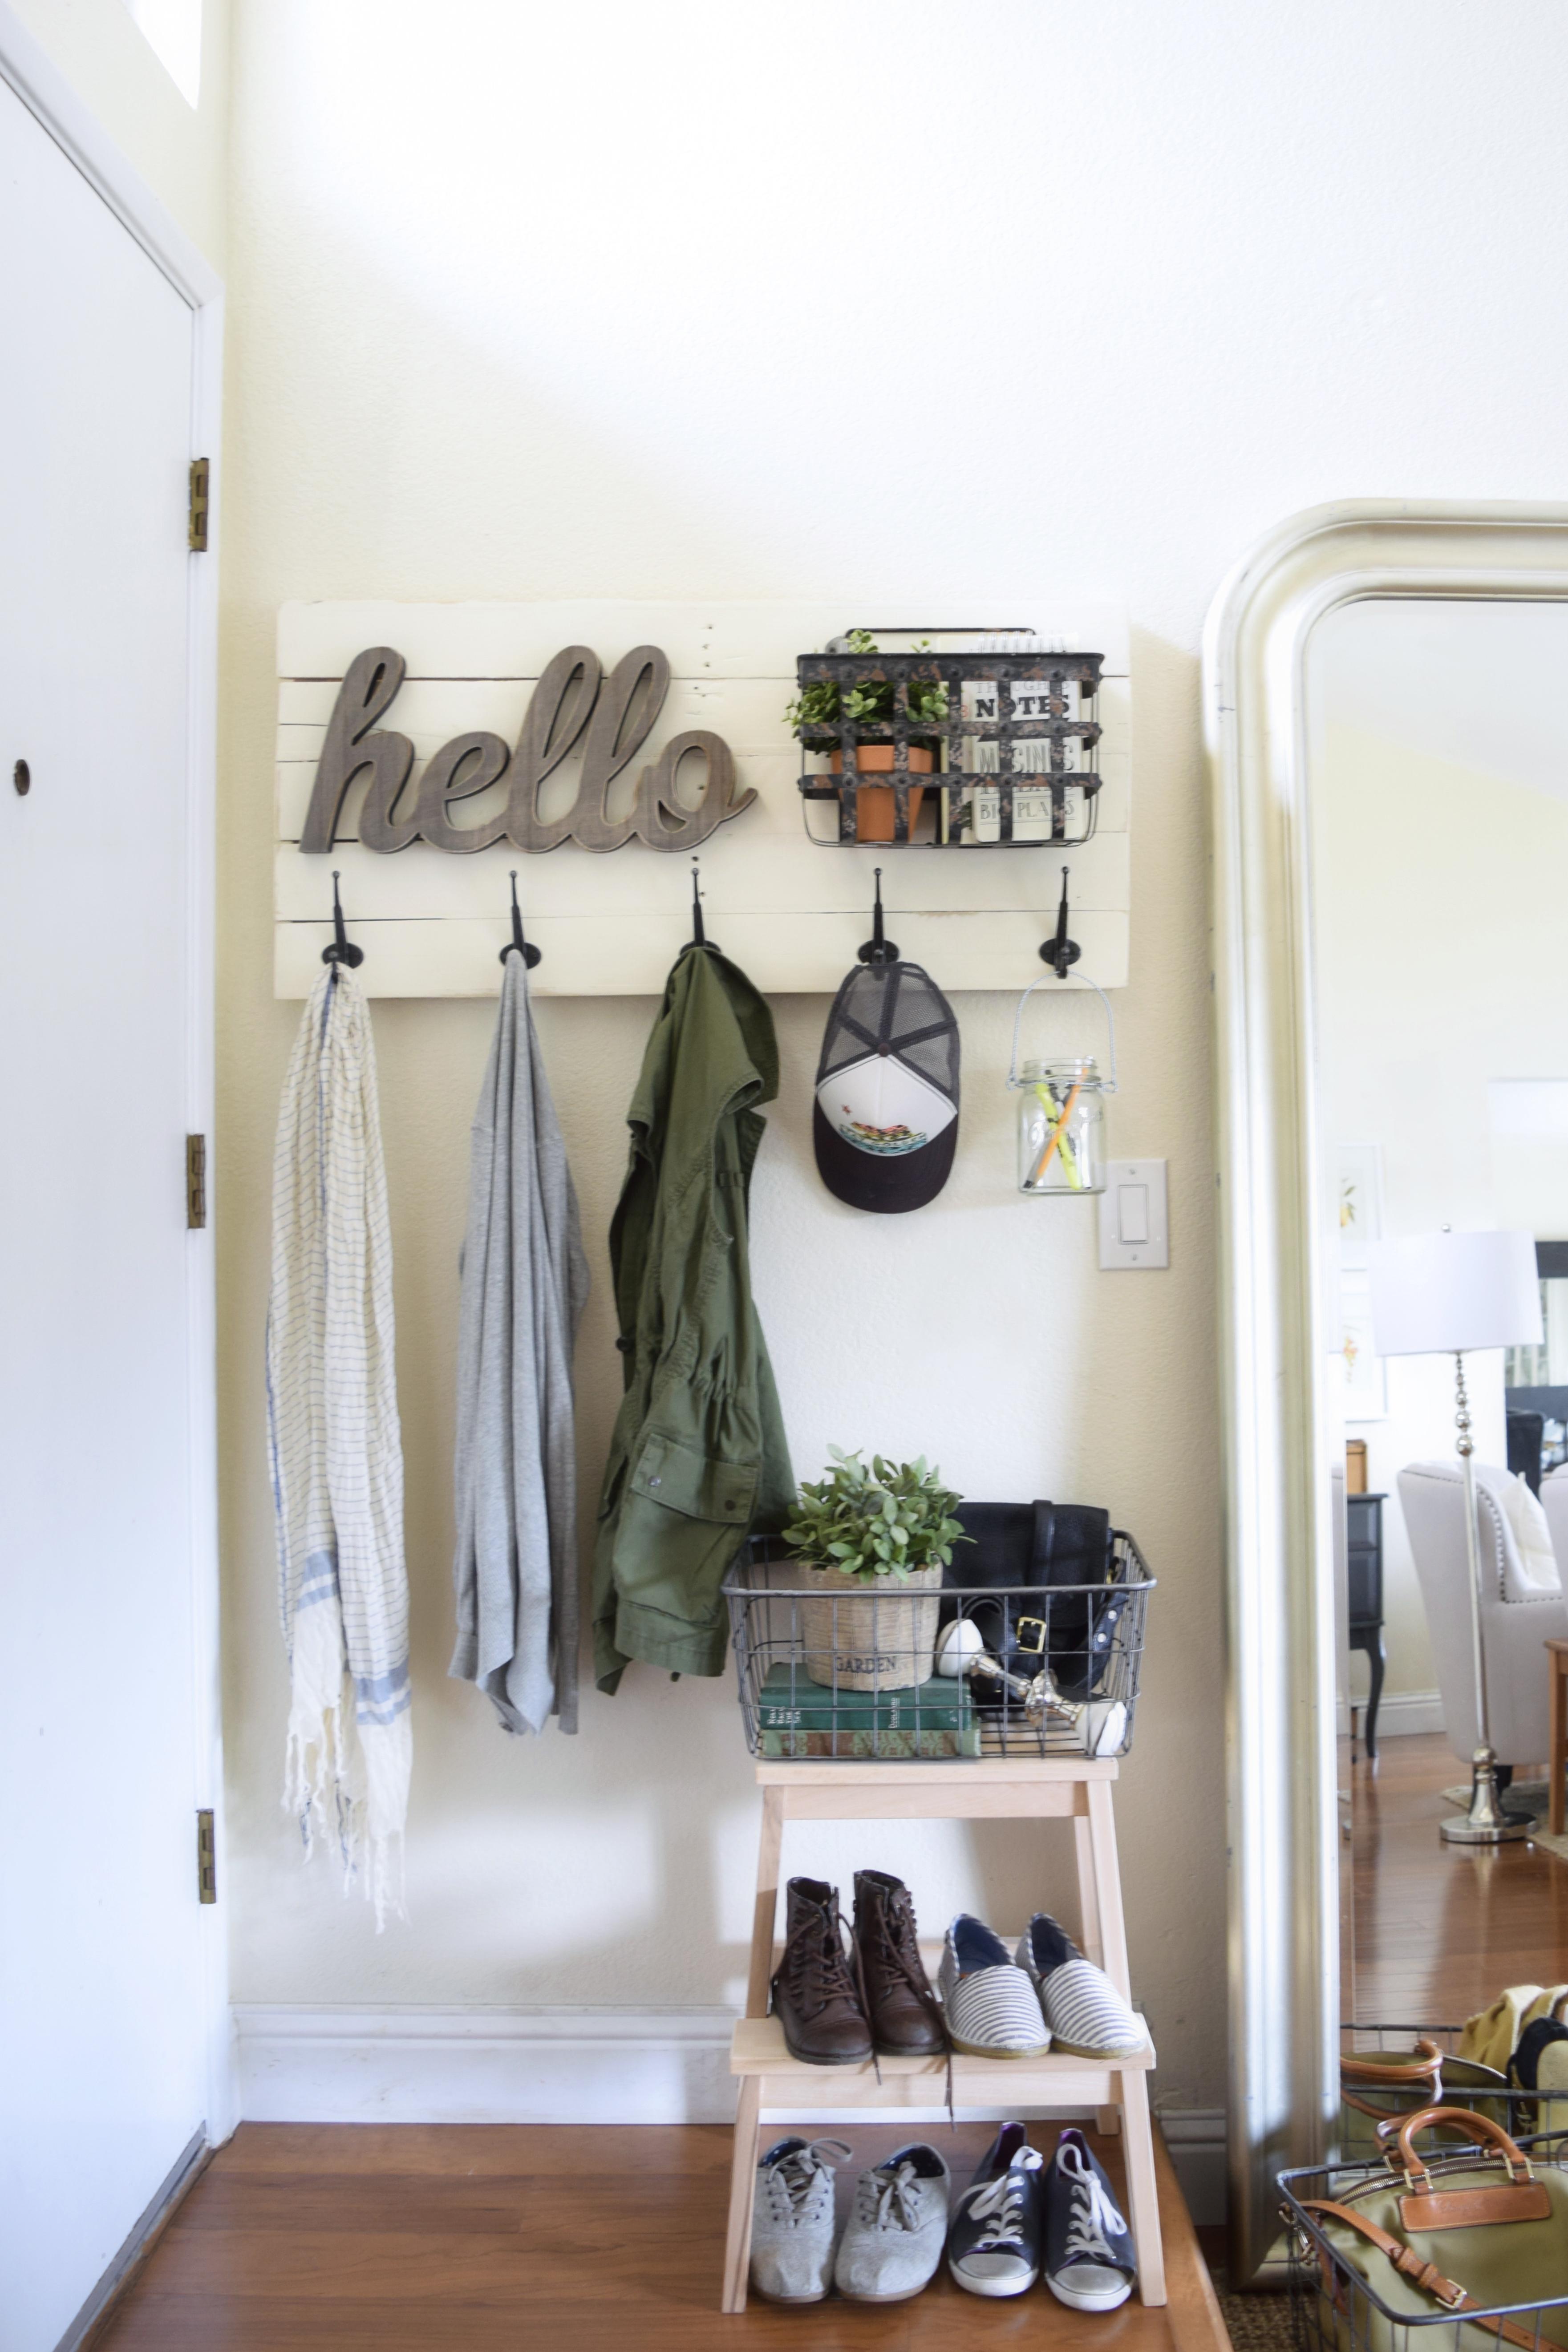 Diy Fun Personalized Wall Mounted Coat Hanger Almafied Com